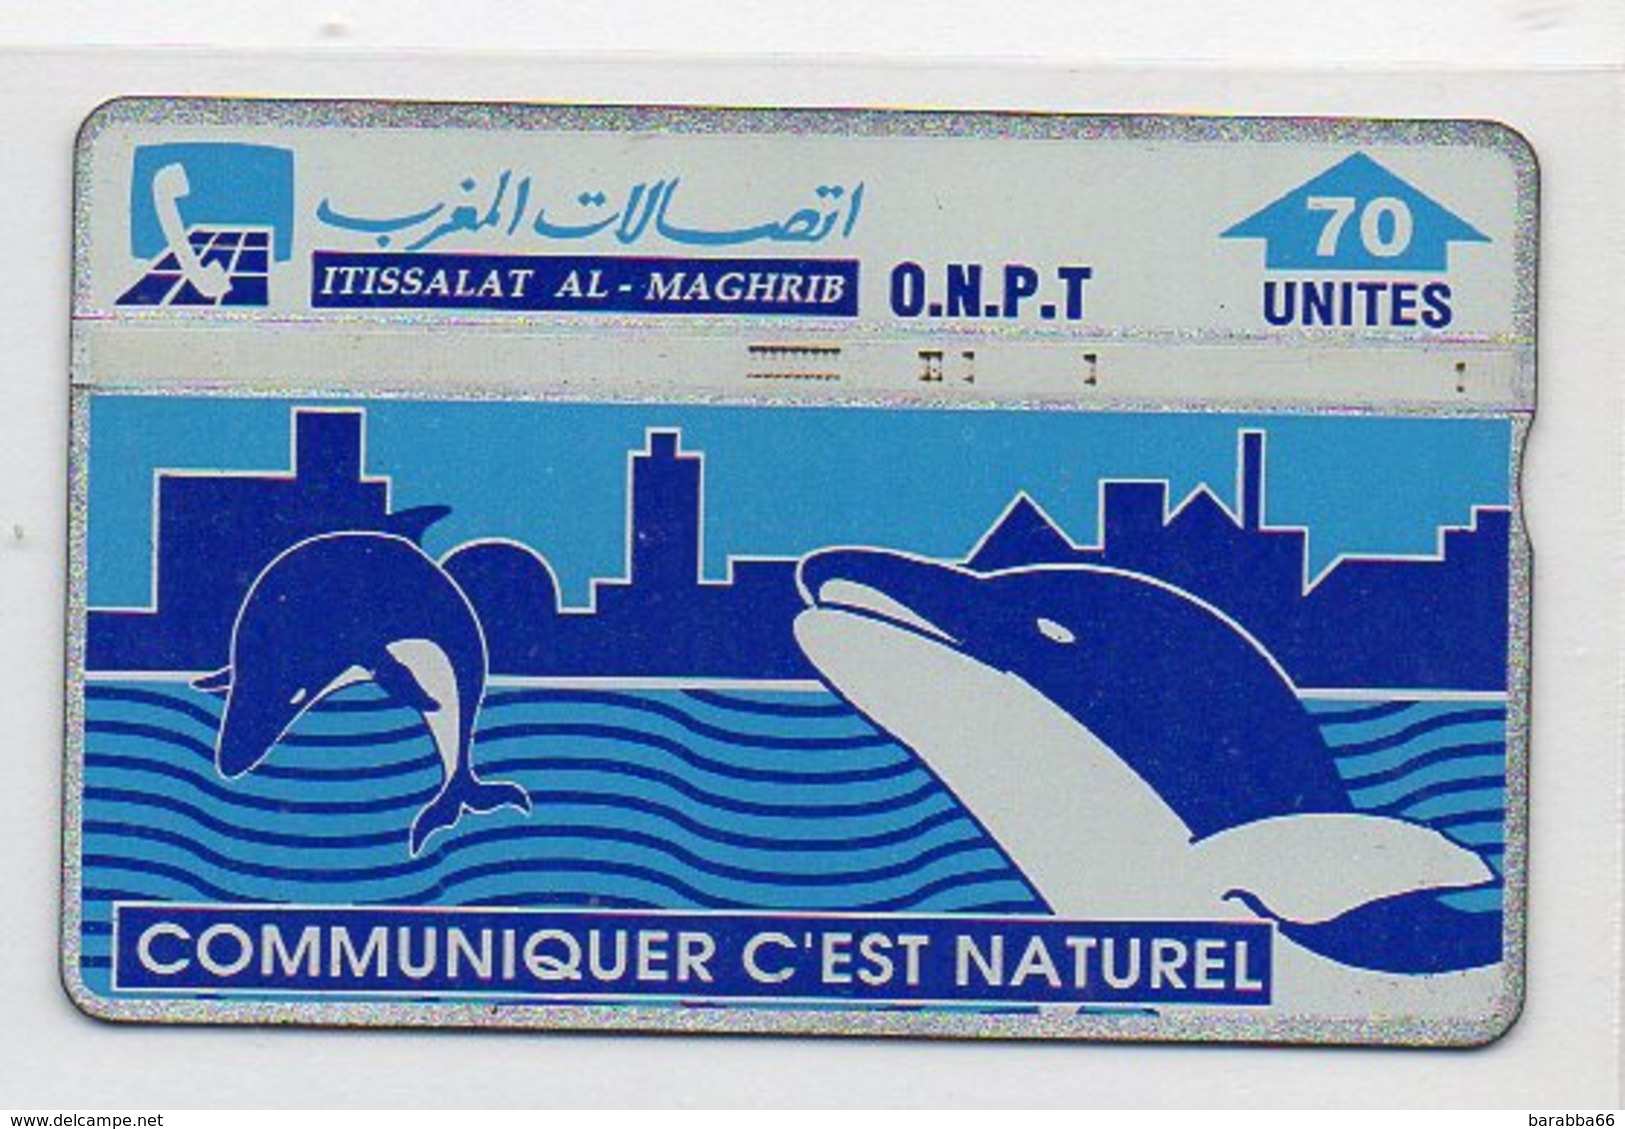 O.N.P.T. 70 UNITES - DOLPHINS - Maroc